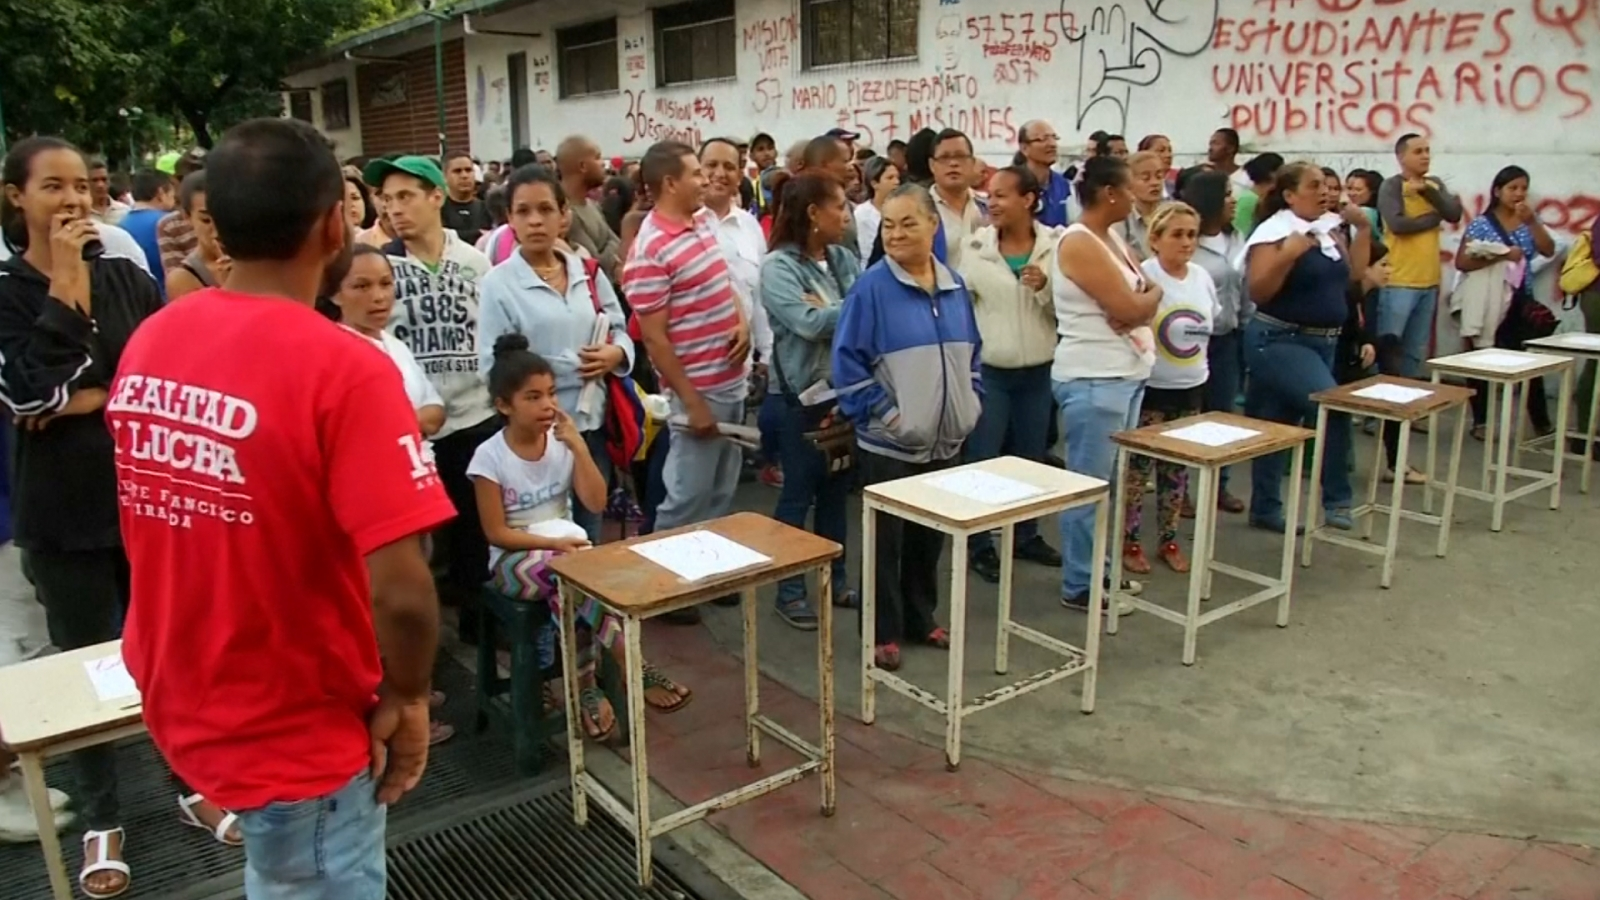 venezuela-goes-to-polls-as-opposition-boycotts-nicolas-maduros-socialist-power-grab